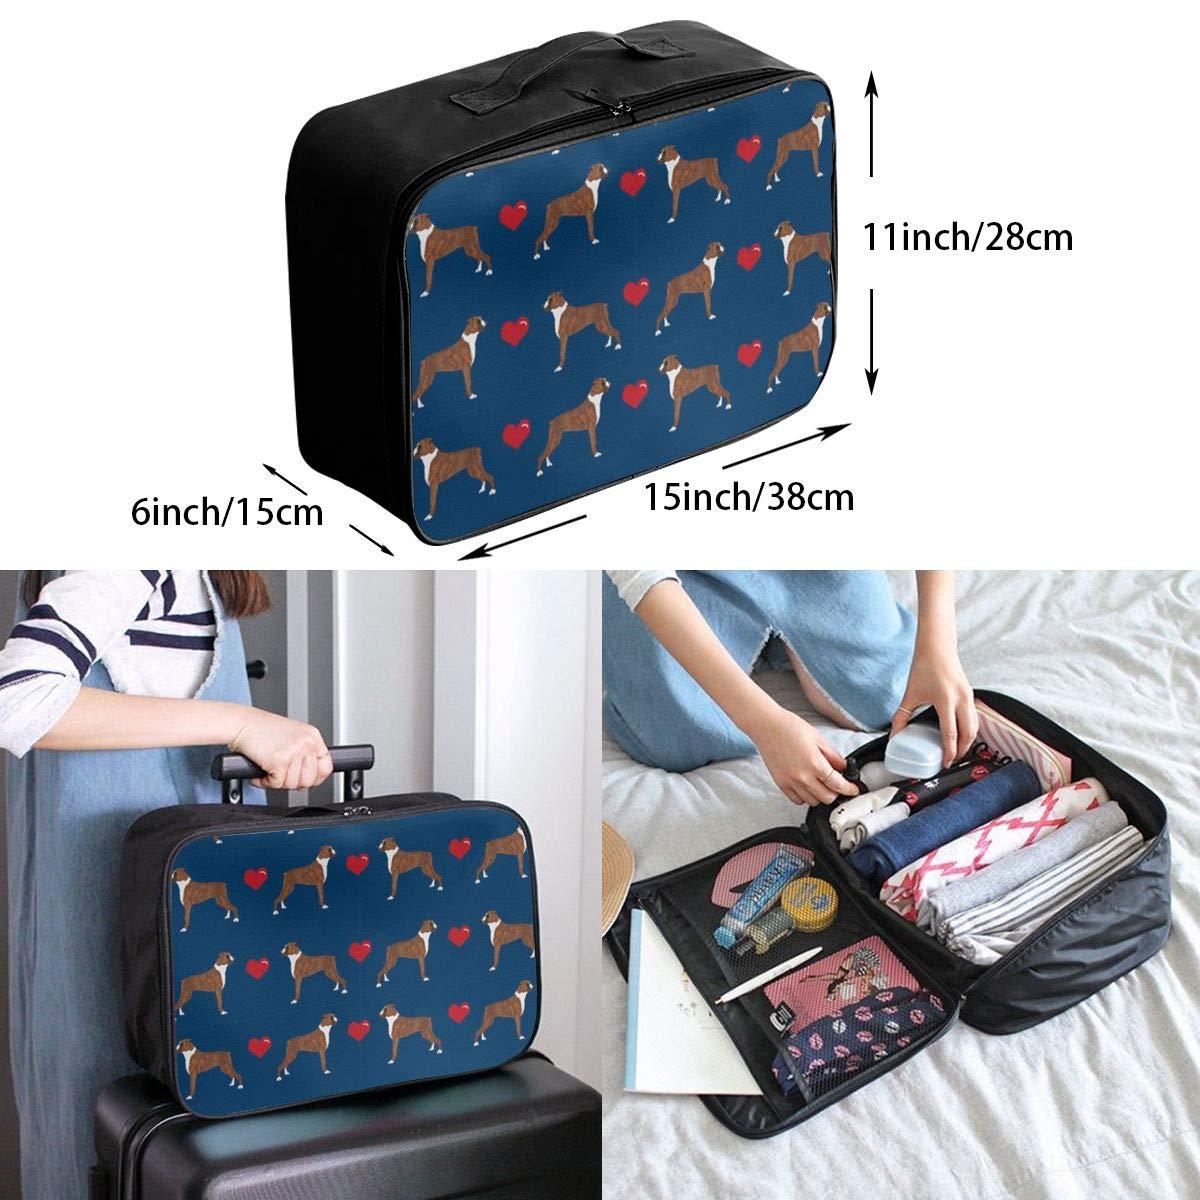 ADGAI Boxer Love Navy Blue Background Canvas Travel Weekender Bag,Fashion Custom Lightweight Large Capacity Portable Luggage Bag,Suitcase Trolley Bag